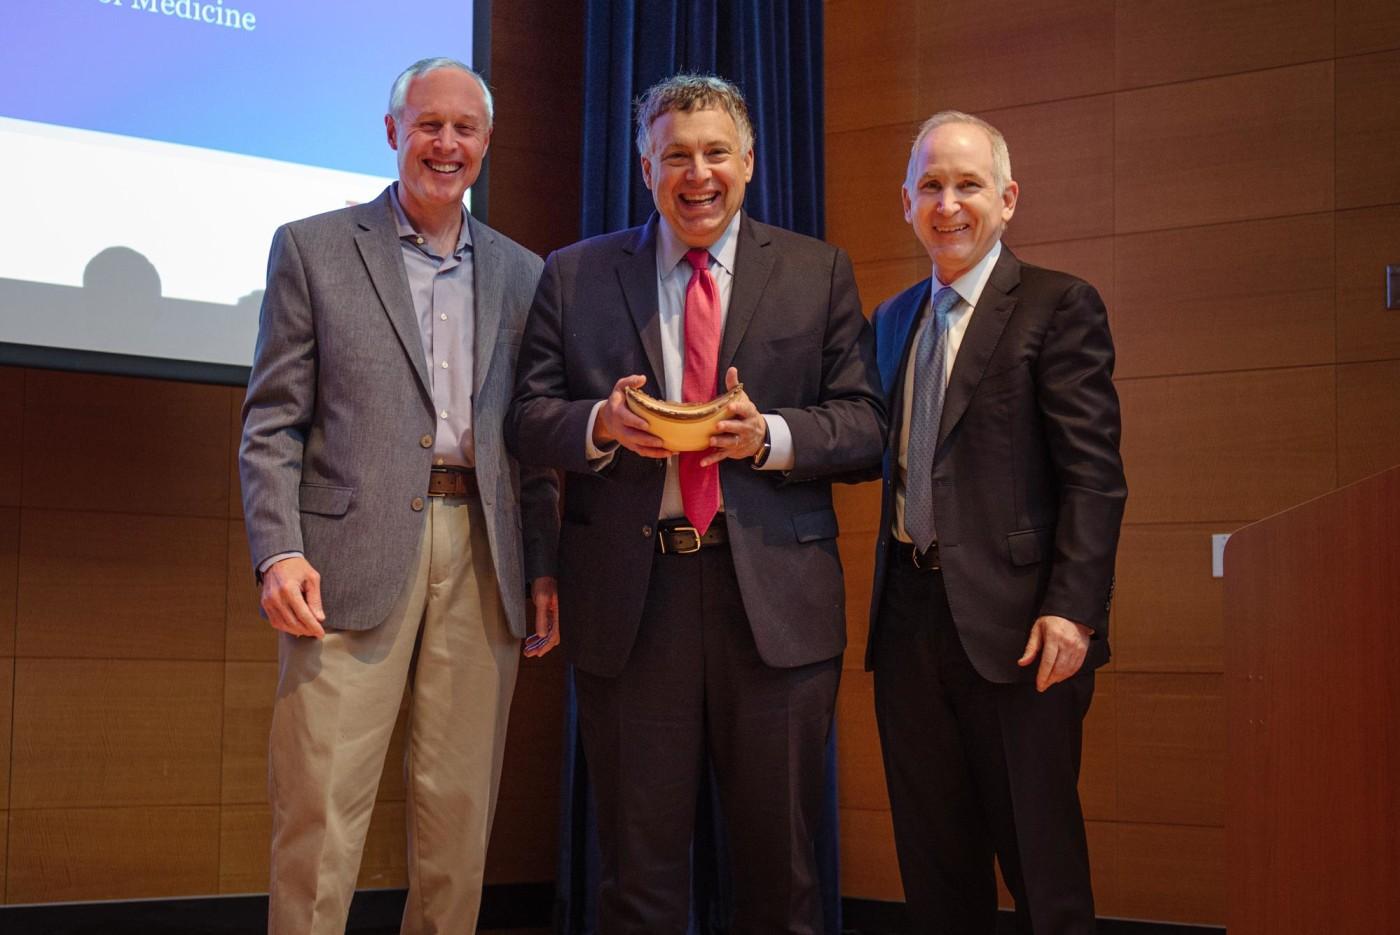 David Schatz, Roy Herbst and Charles Fuchs on stage